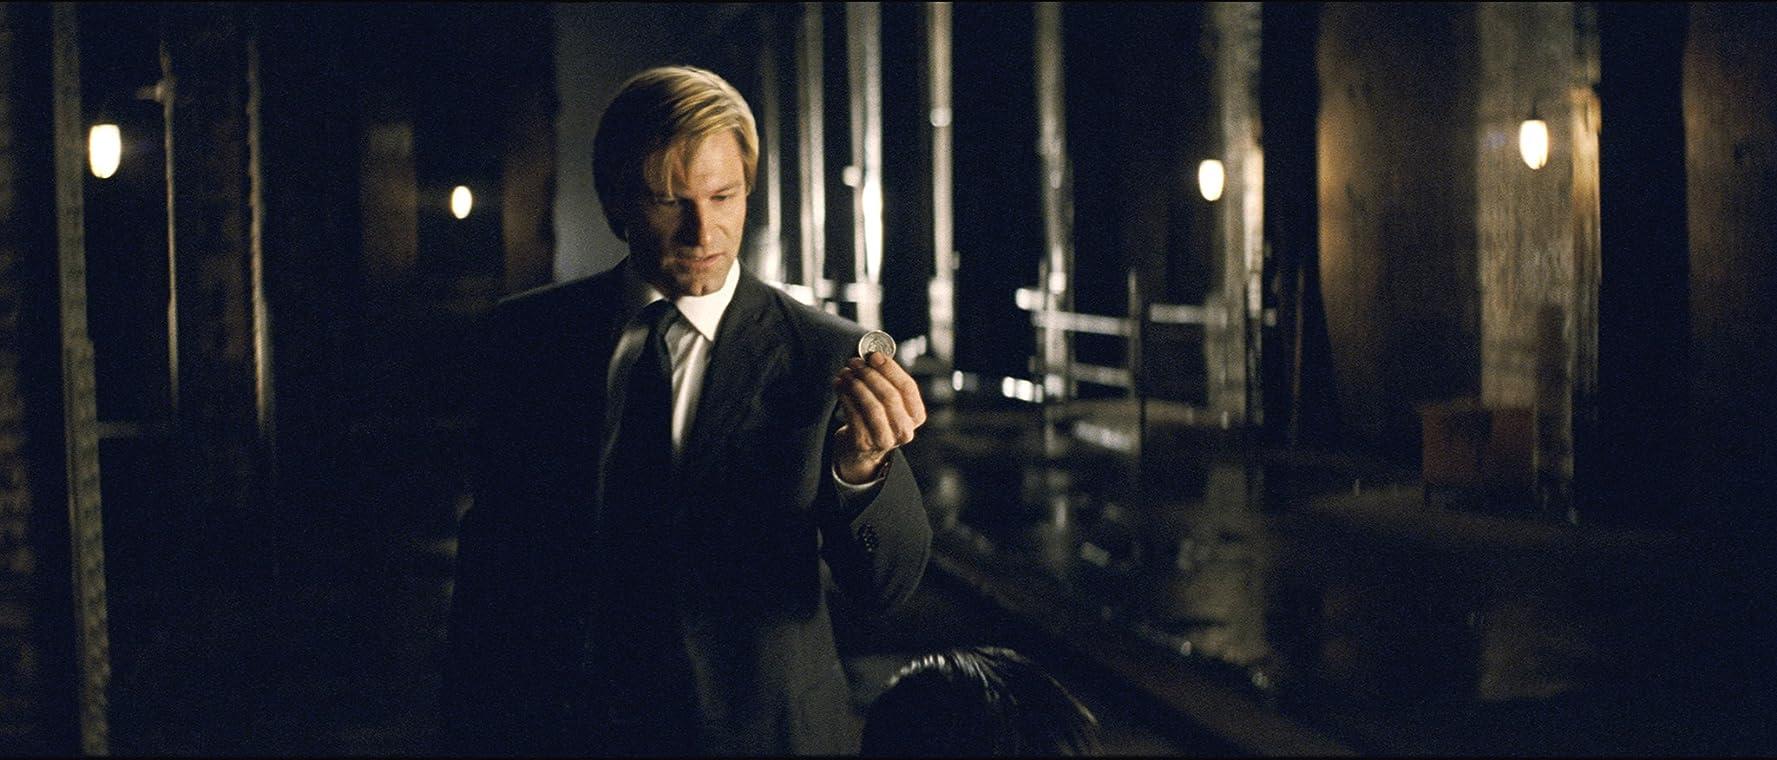 Aaron Eckhart in The Dark Knight (2008)